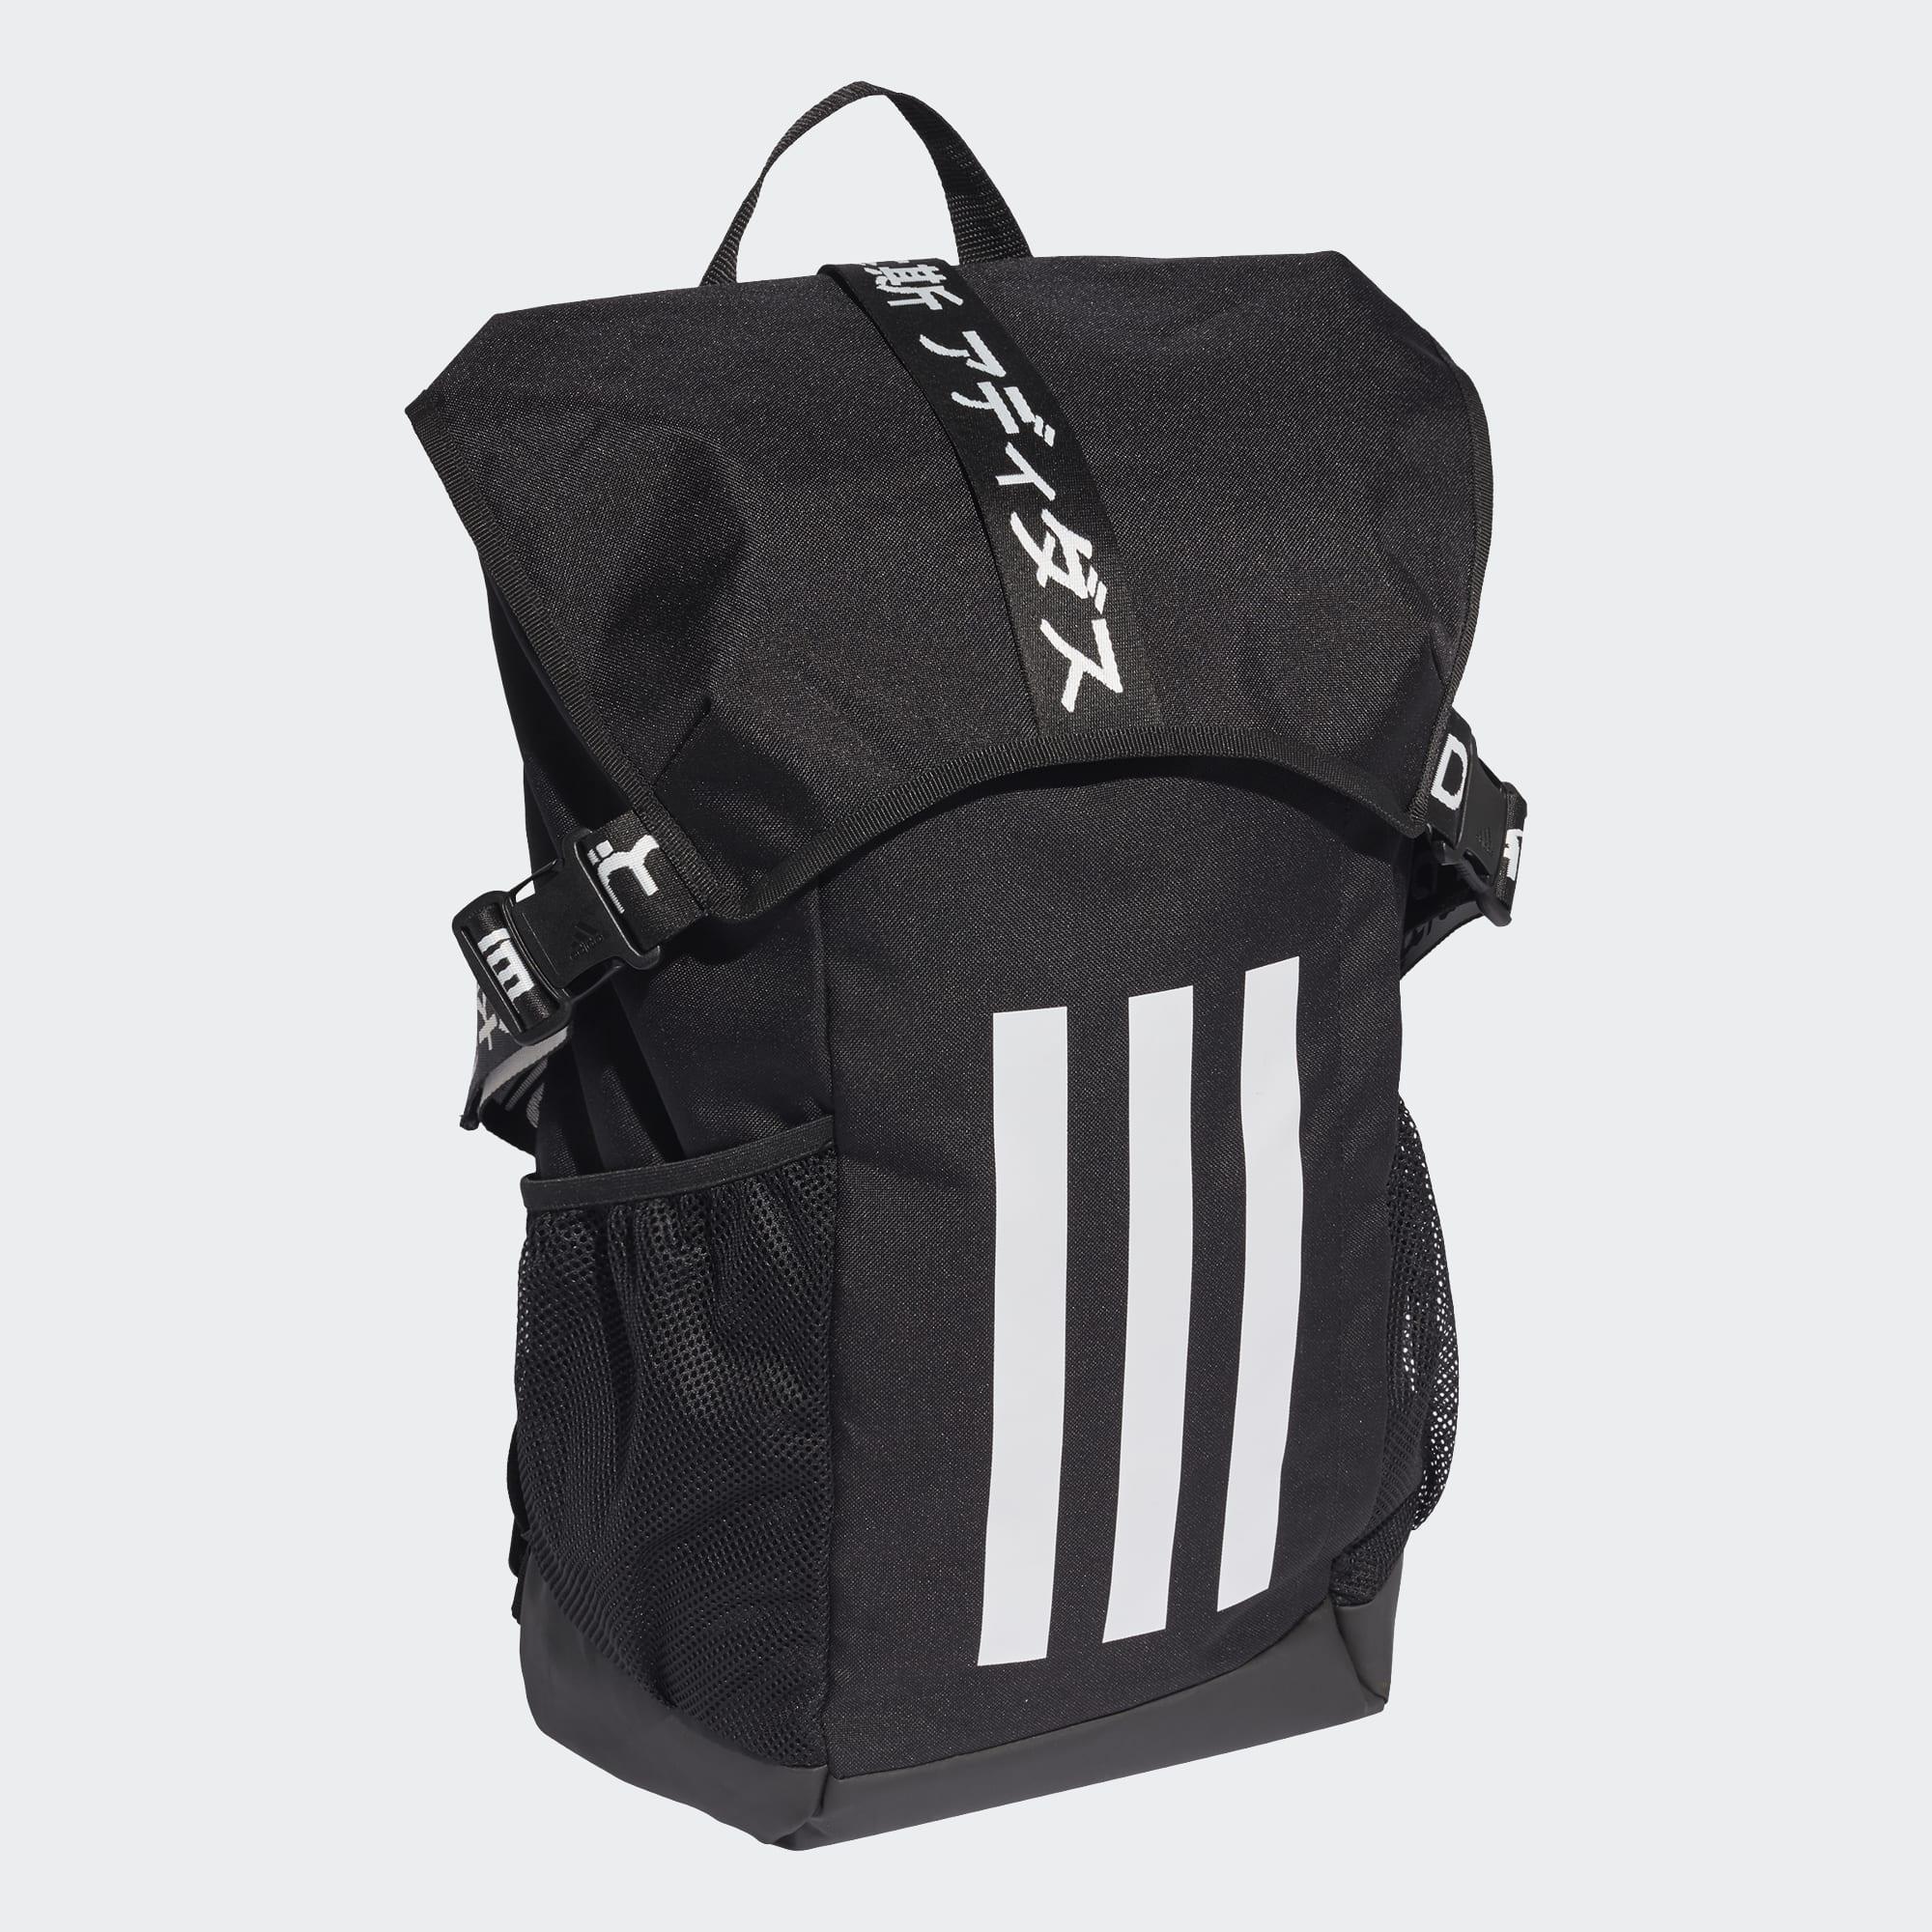 Adidas 4ATHLTS Rucksack